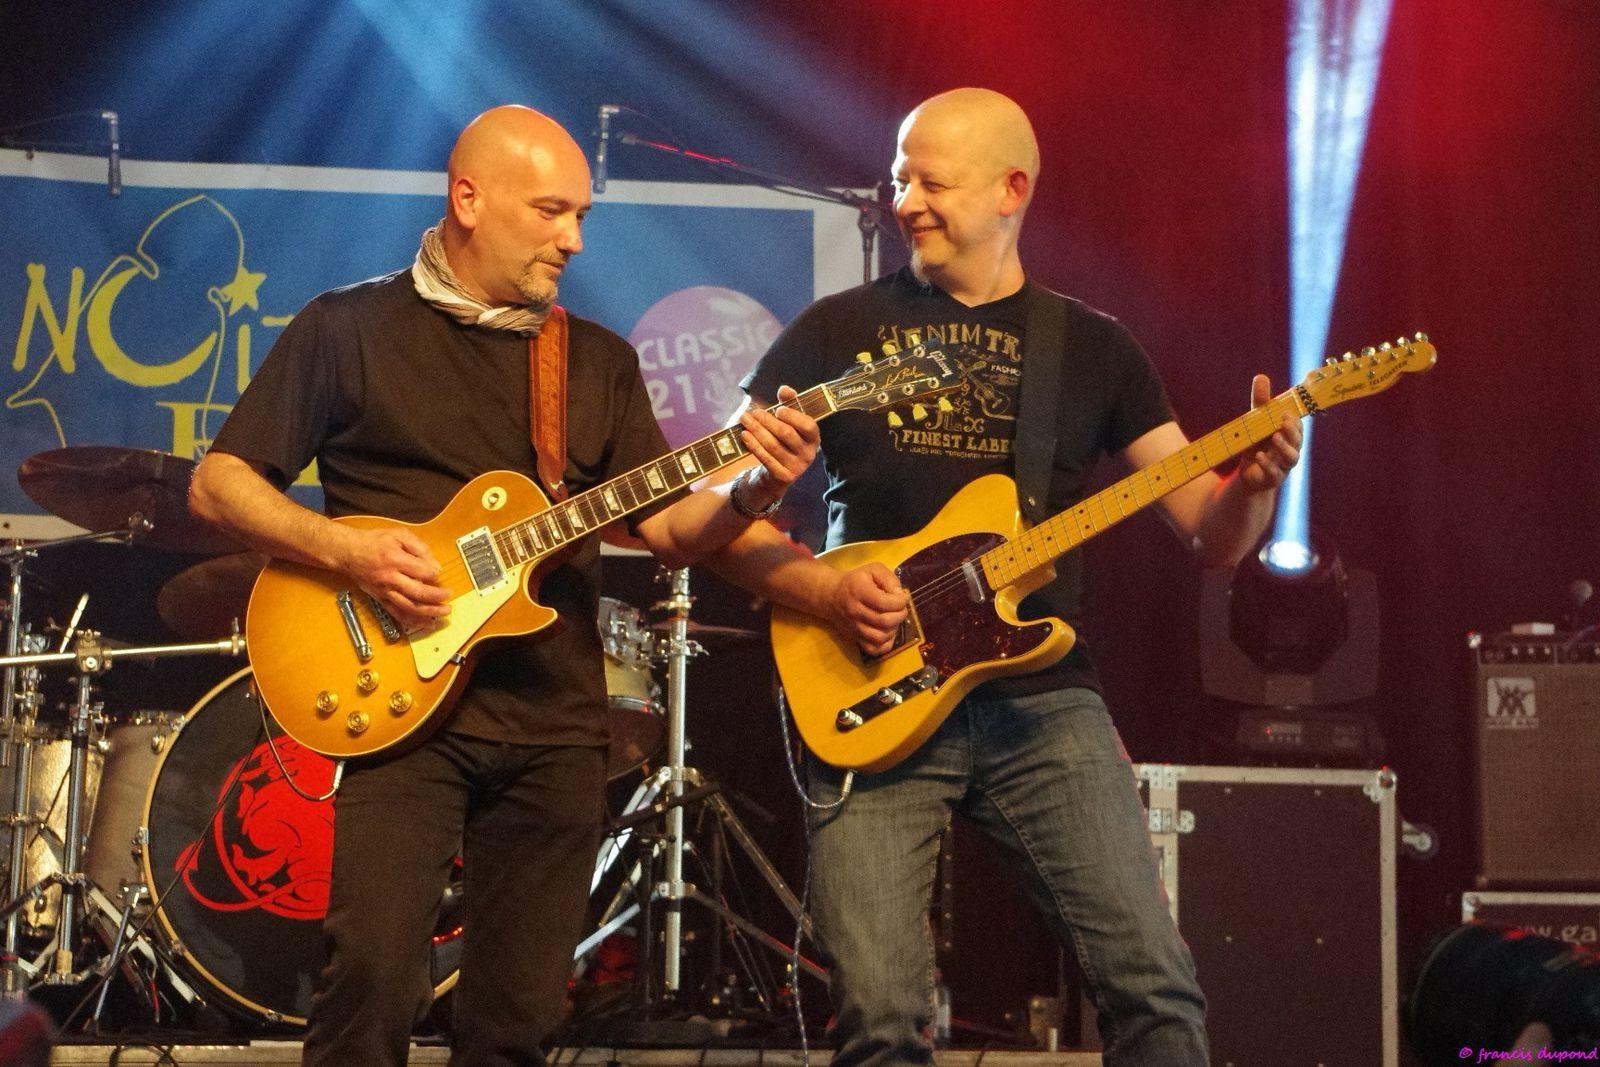 Gallows Pole - Nuit du Blues 2013 - Charleroi (B)